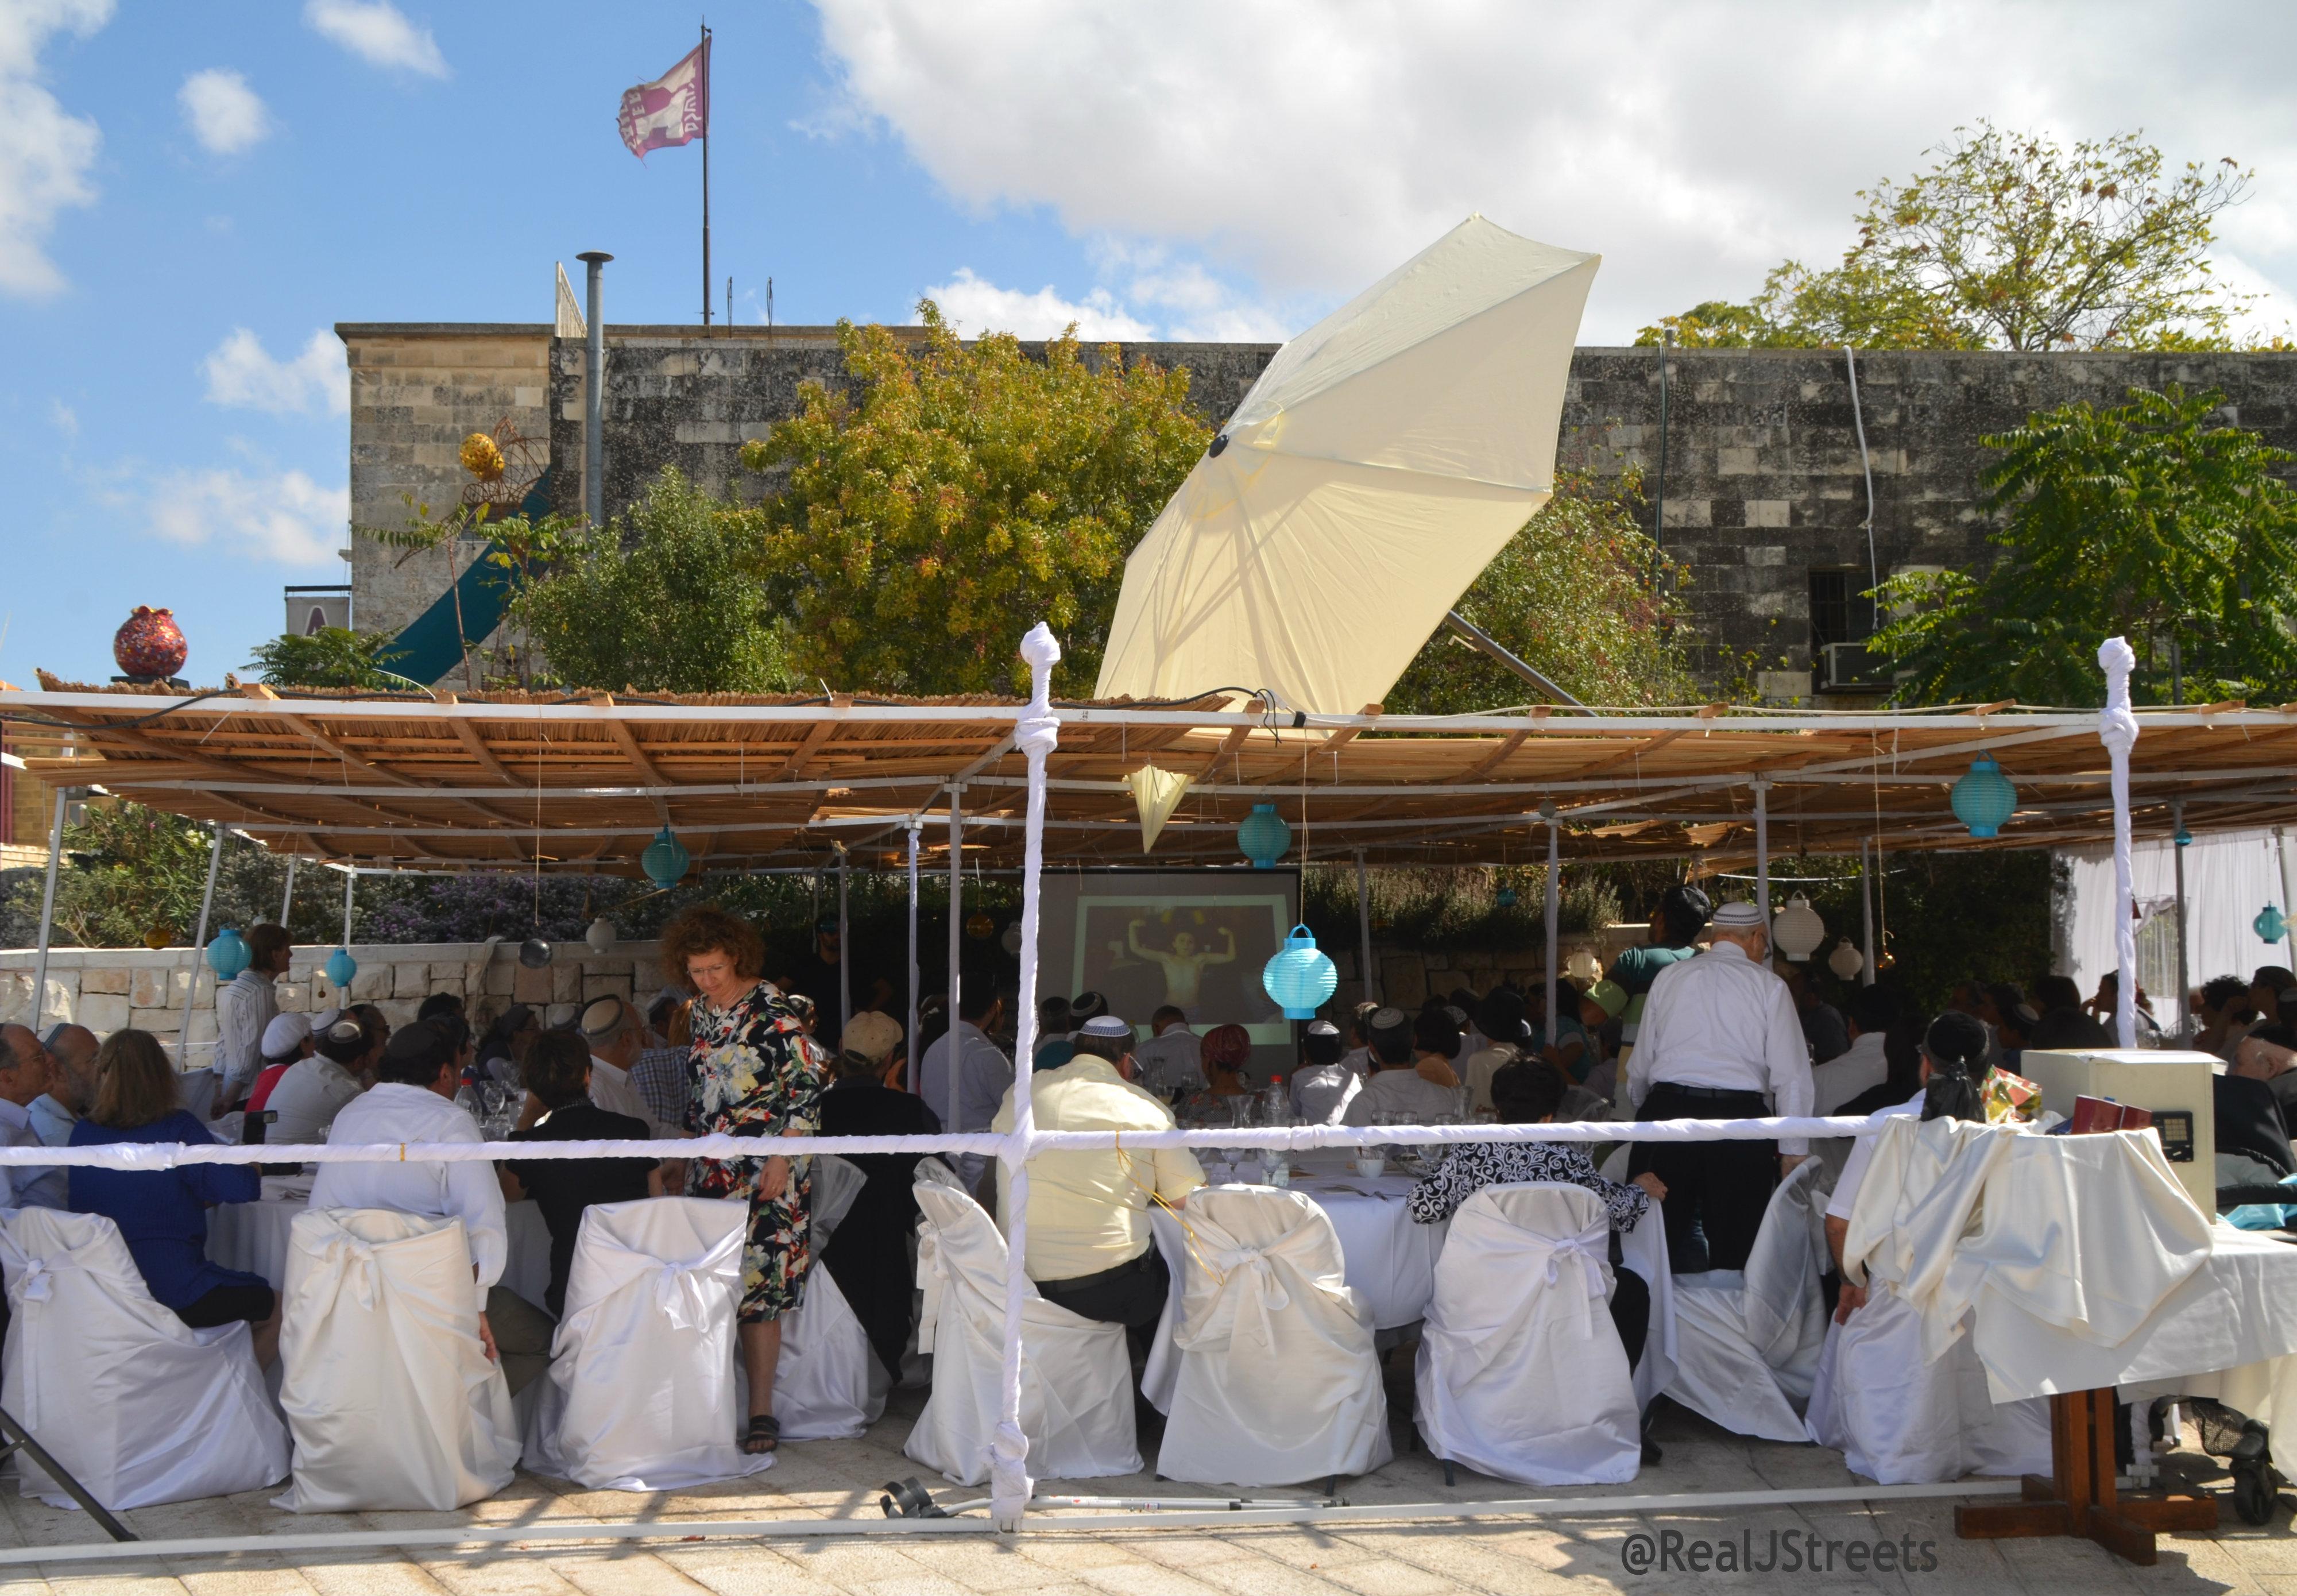 Sukkah open walls image